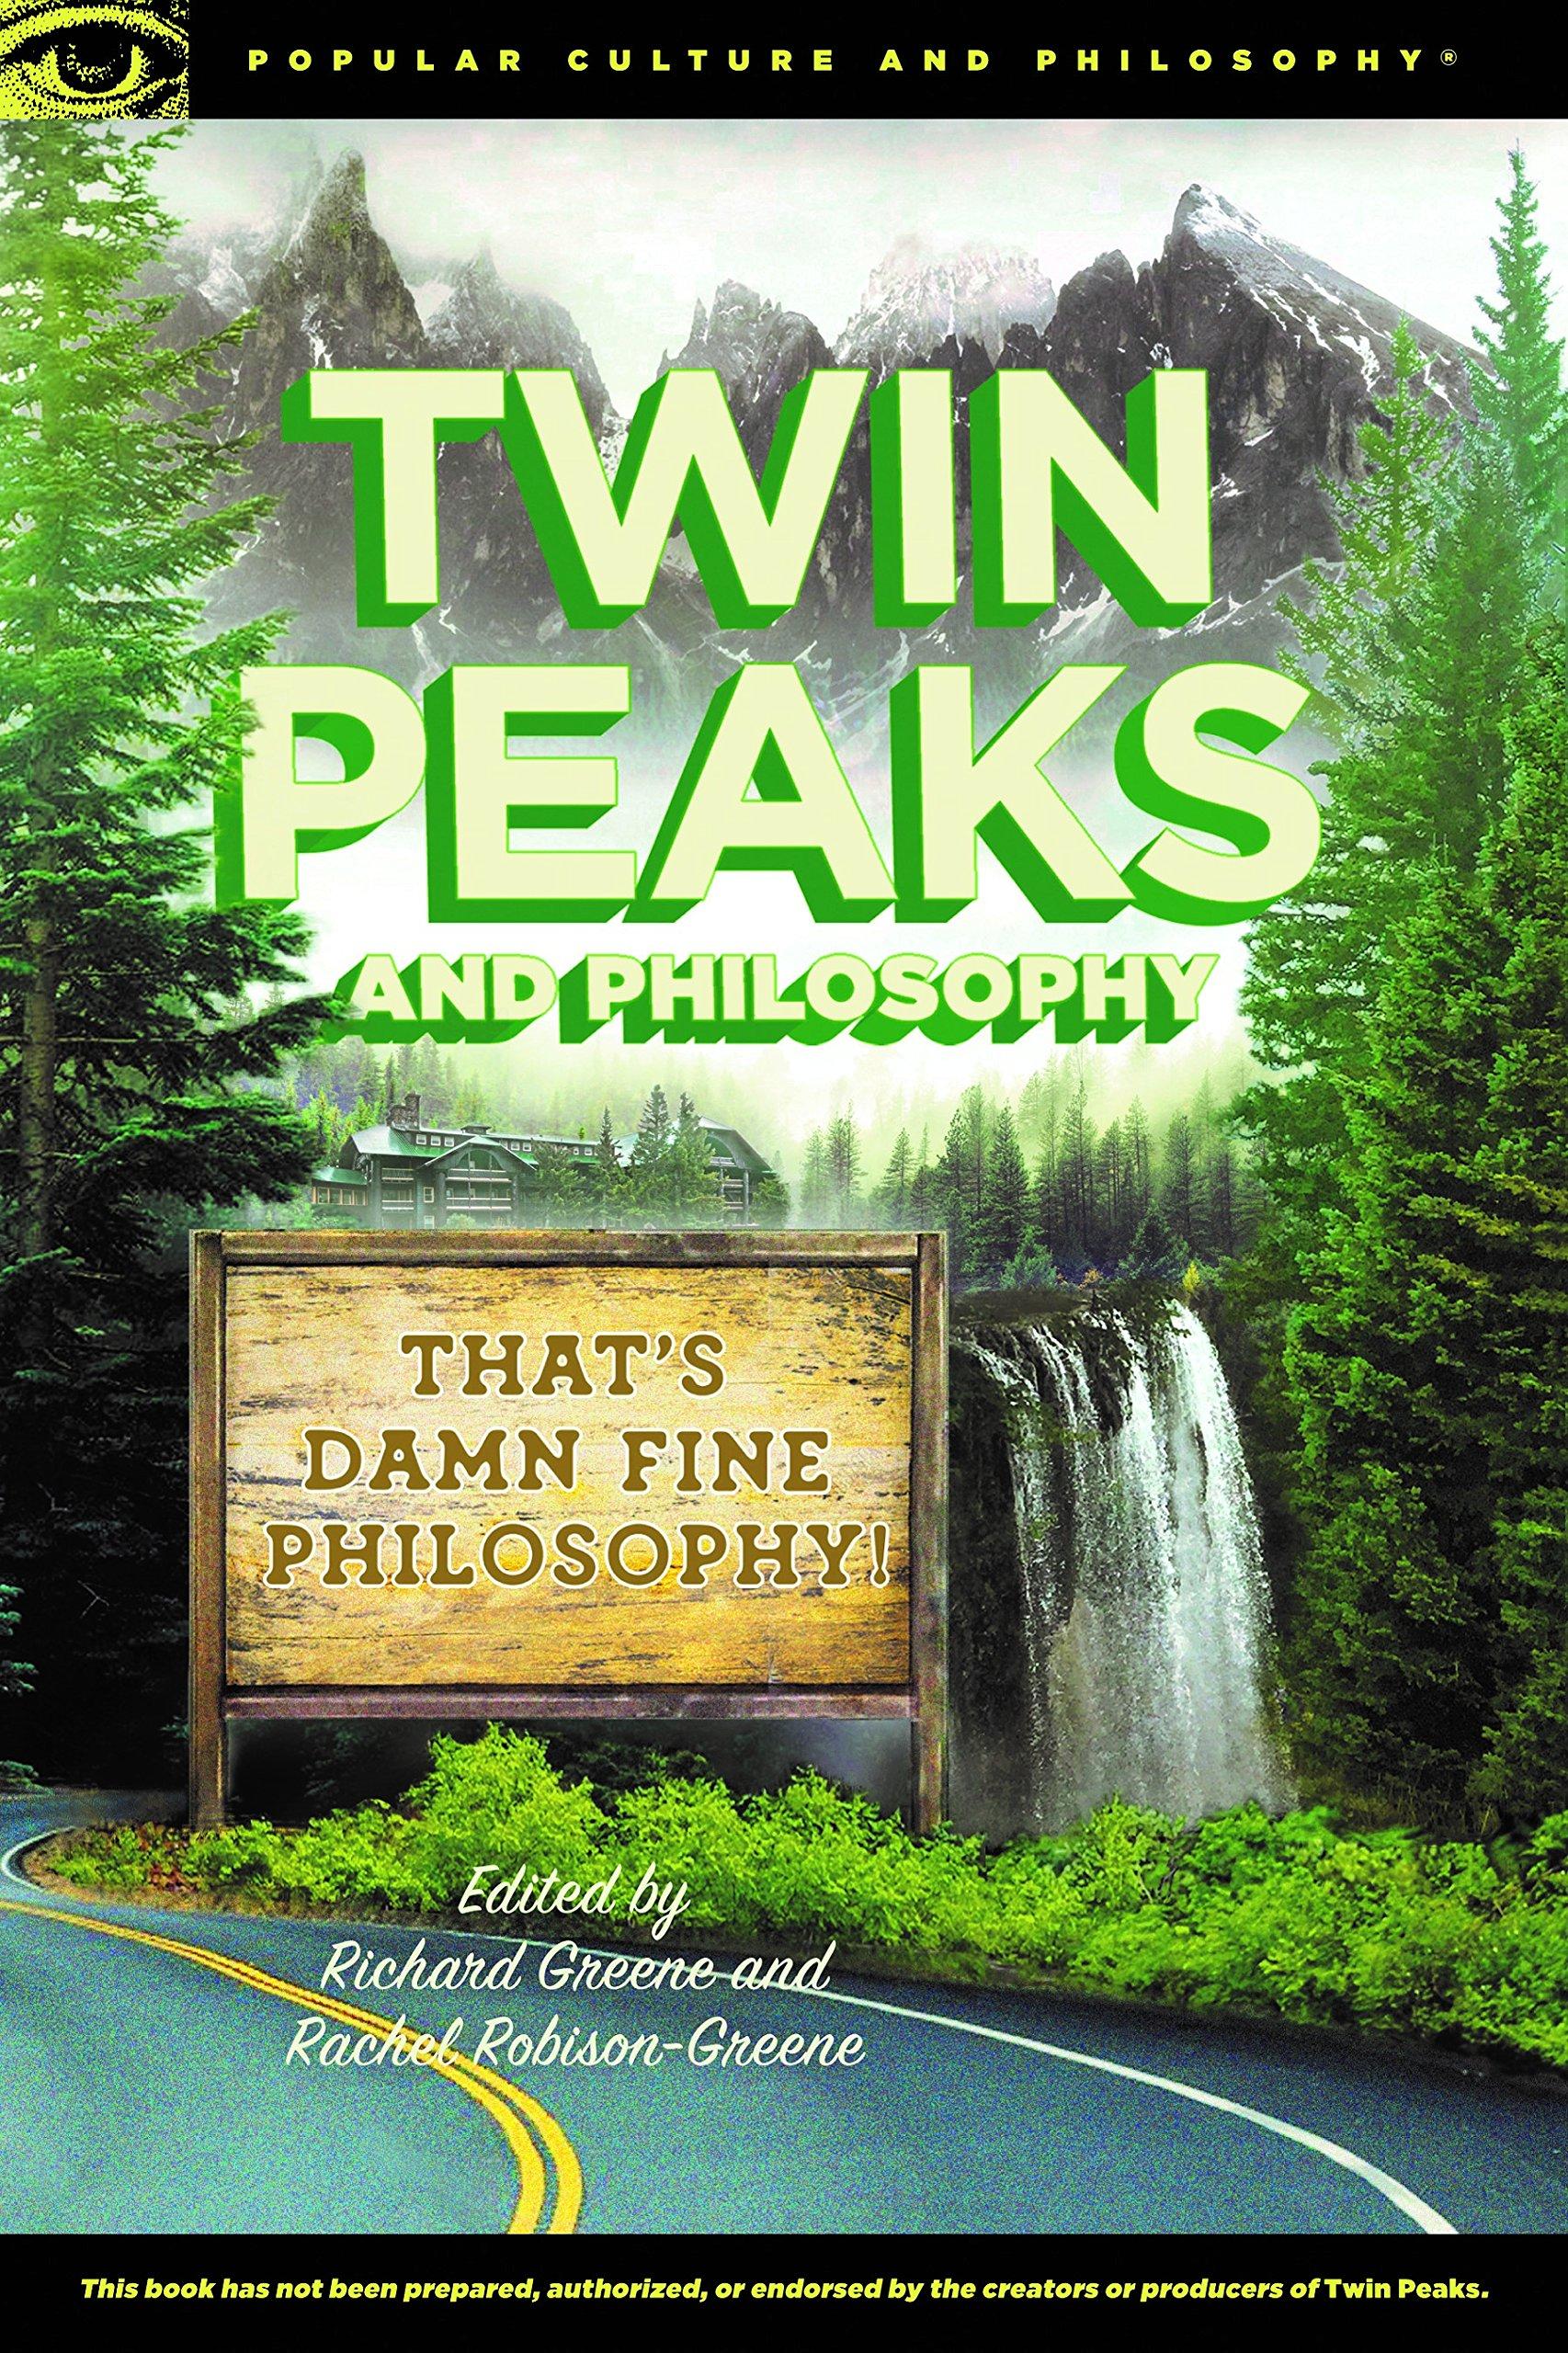 Twin Peaks and Philosophy: Thats Damn Fine Philosophy!: 119 Popular Culture and Philosophy: Amazon.es: Greene, Richard, Robison-Greene, Rachel: Libros en idiomas extranjeros